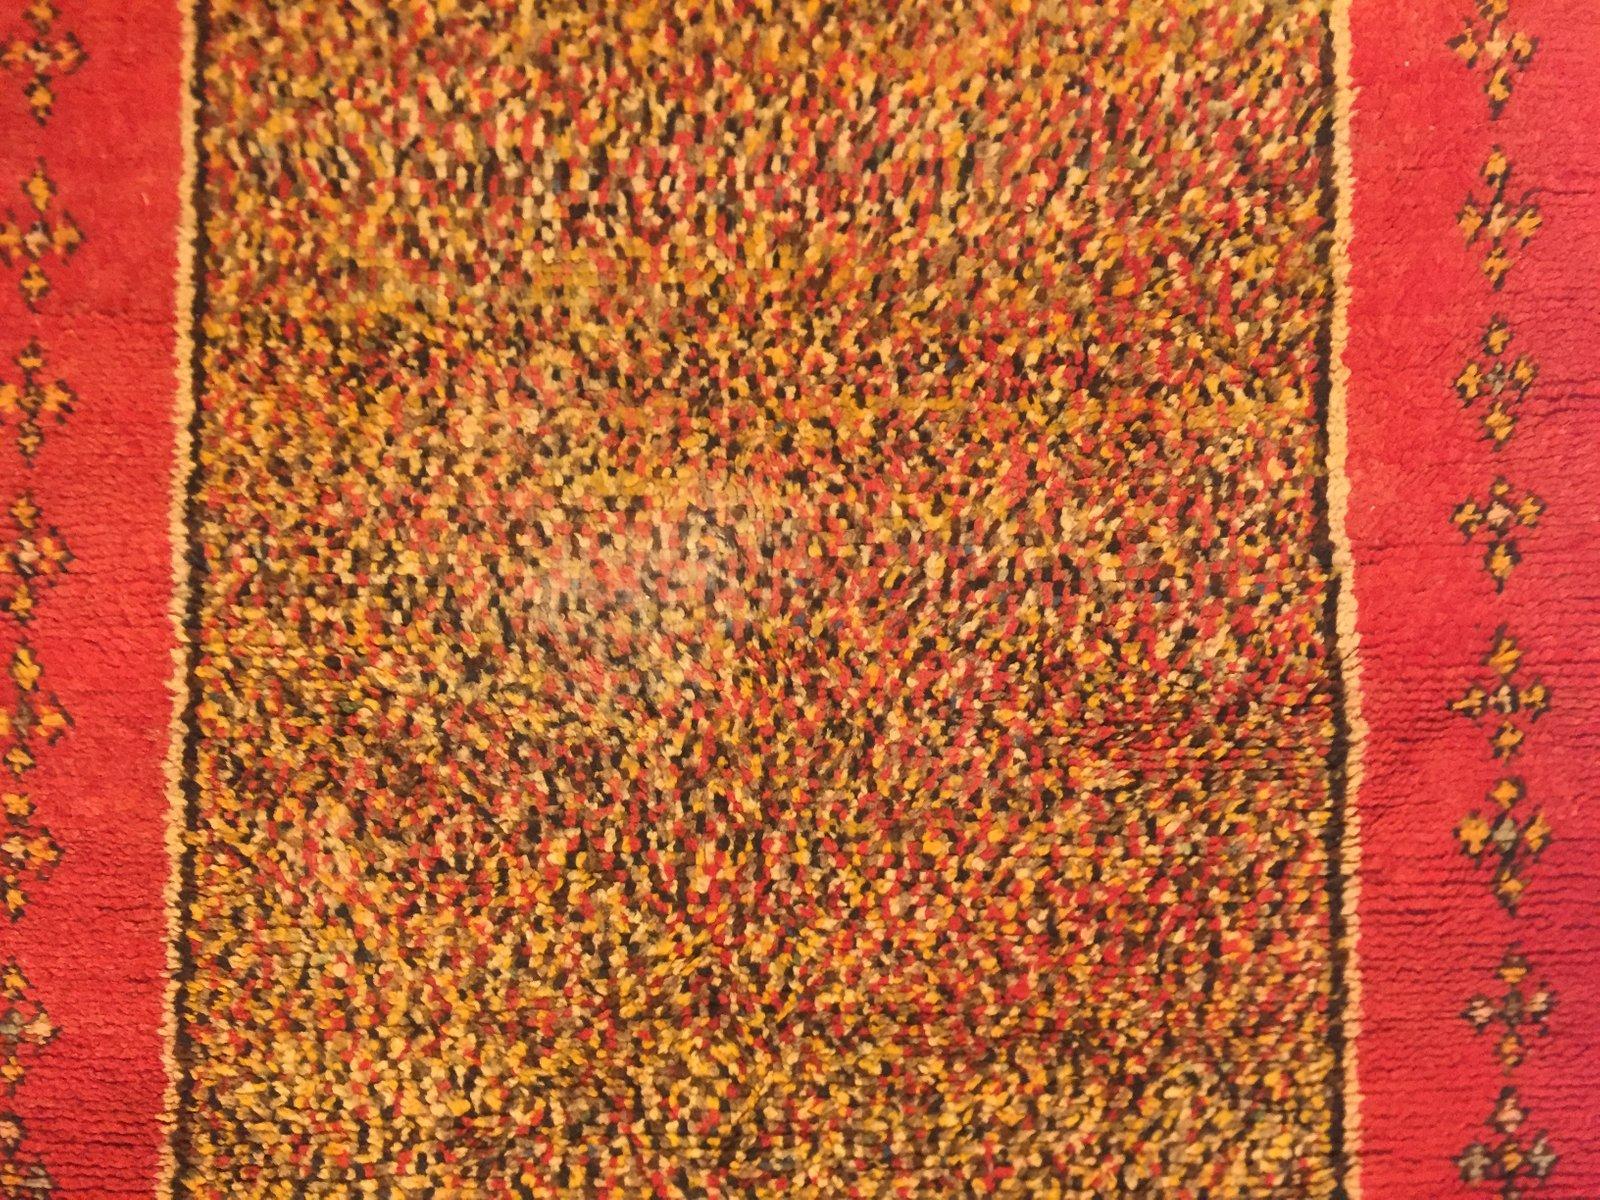 vintage berber teppich in safrangelb rot bei pamono kaufen. Black Bedroom Furniture Sets. Home Design Ideas